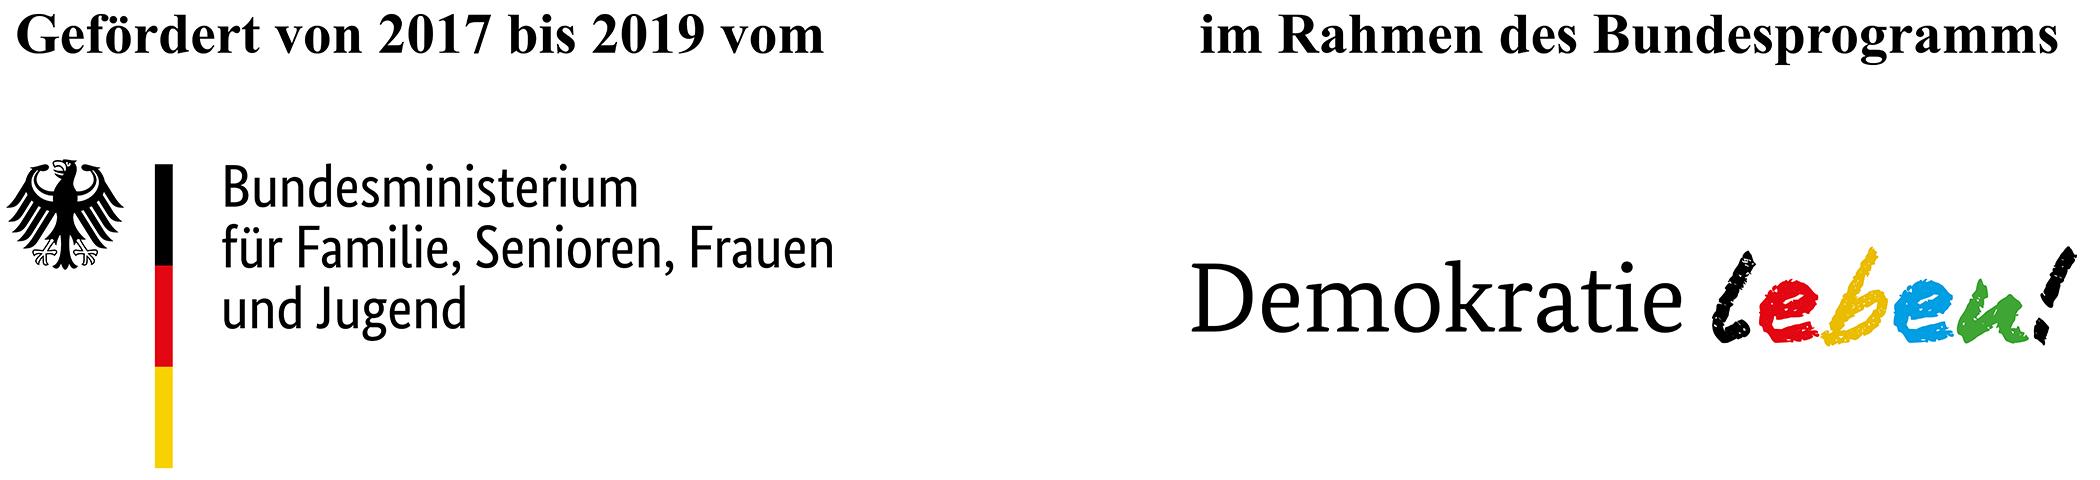 200211-Logo-BMFSFJ+DL+Förderzusatz